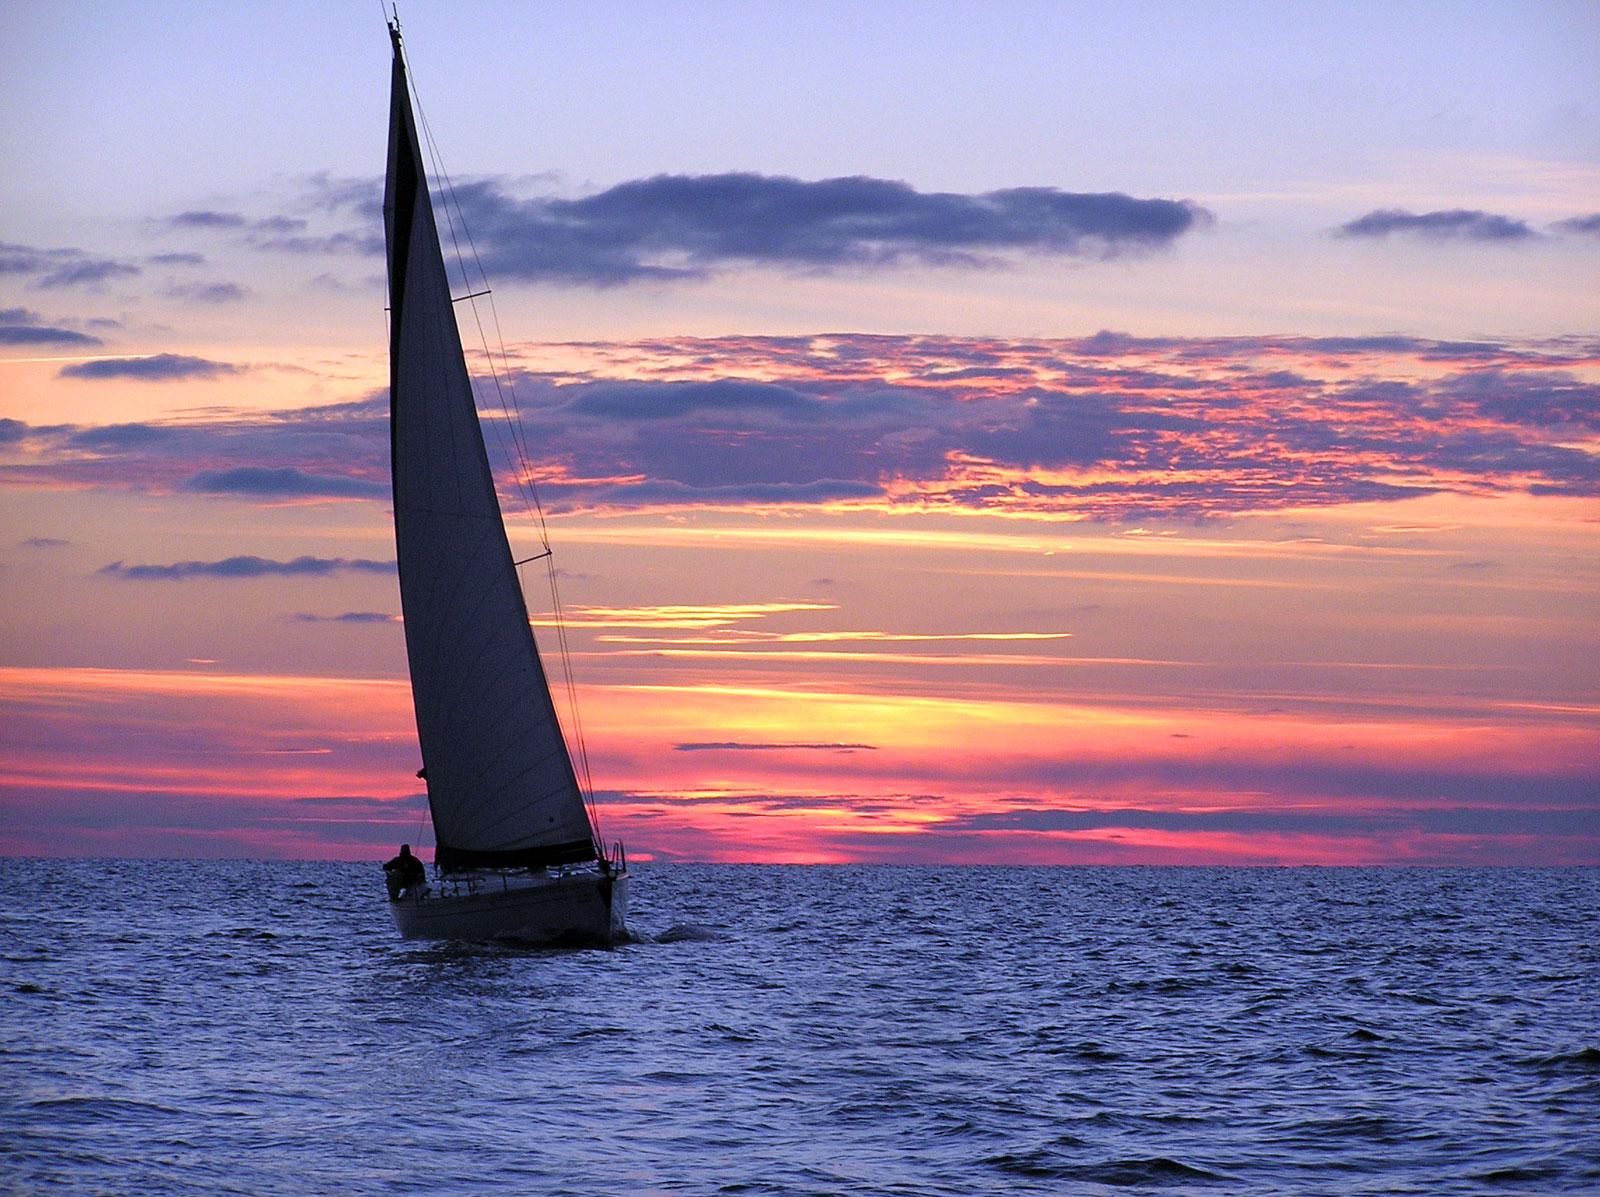 яхты на море картинки